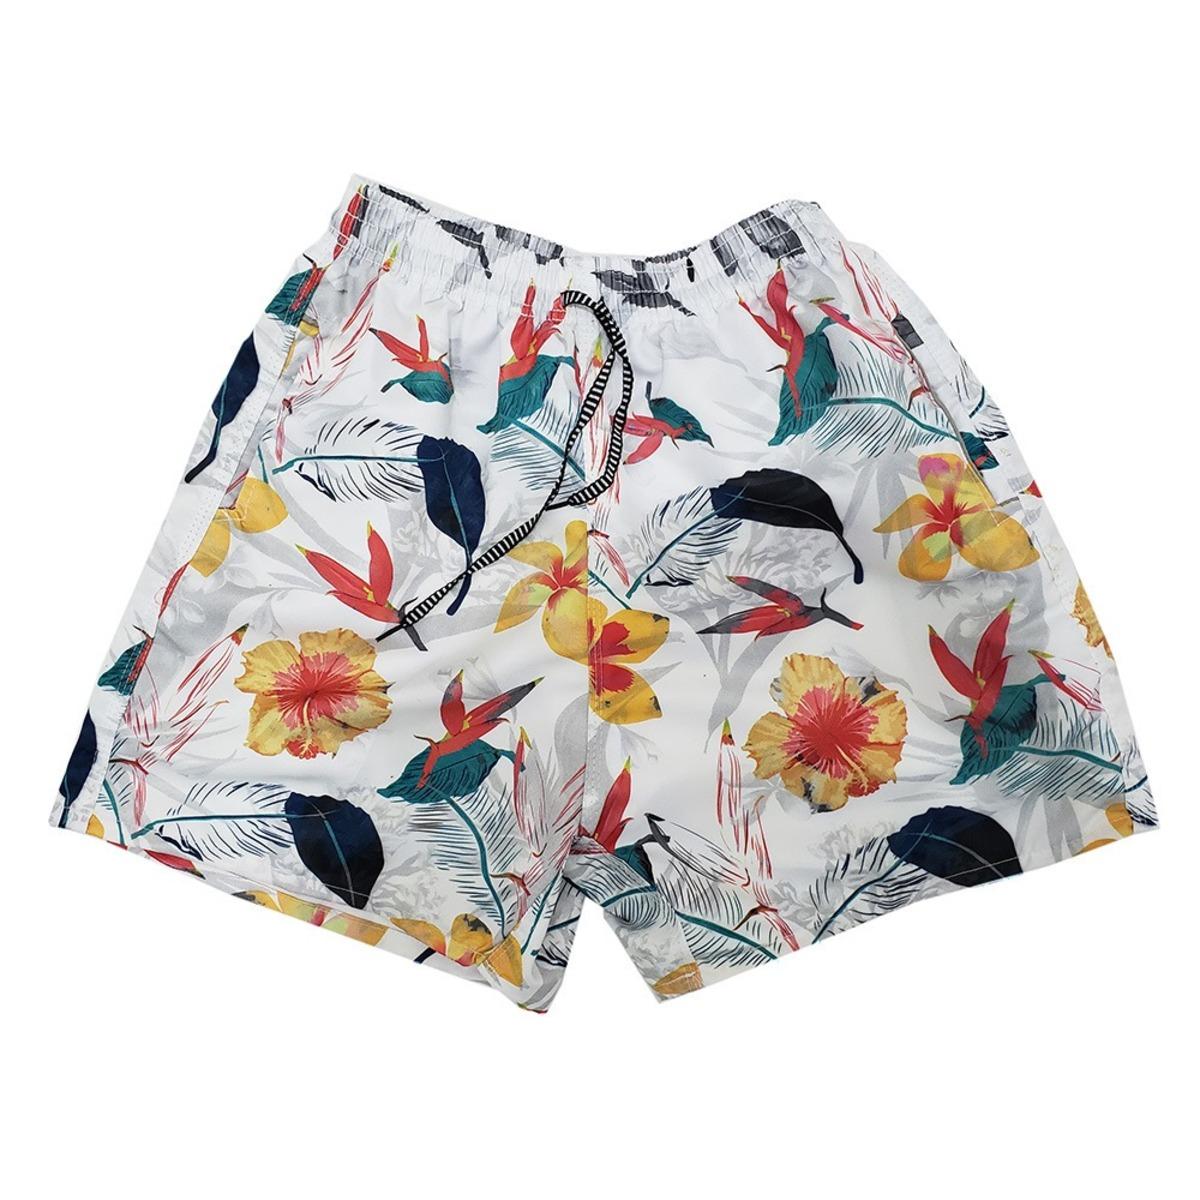 Kit 3 Shorts Mauricinho Bermudas Moda Praia Estilo Neymar